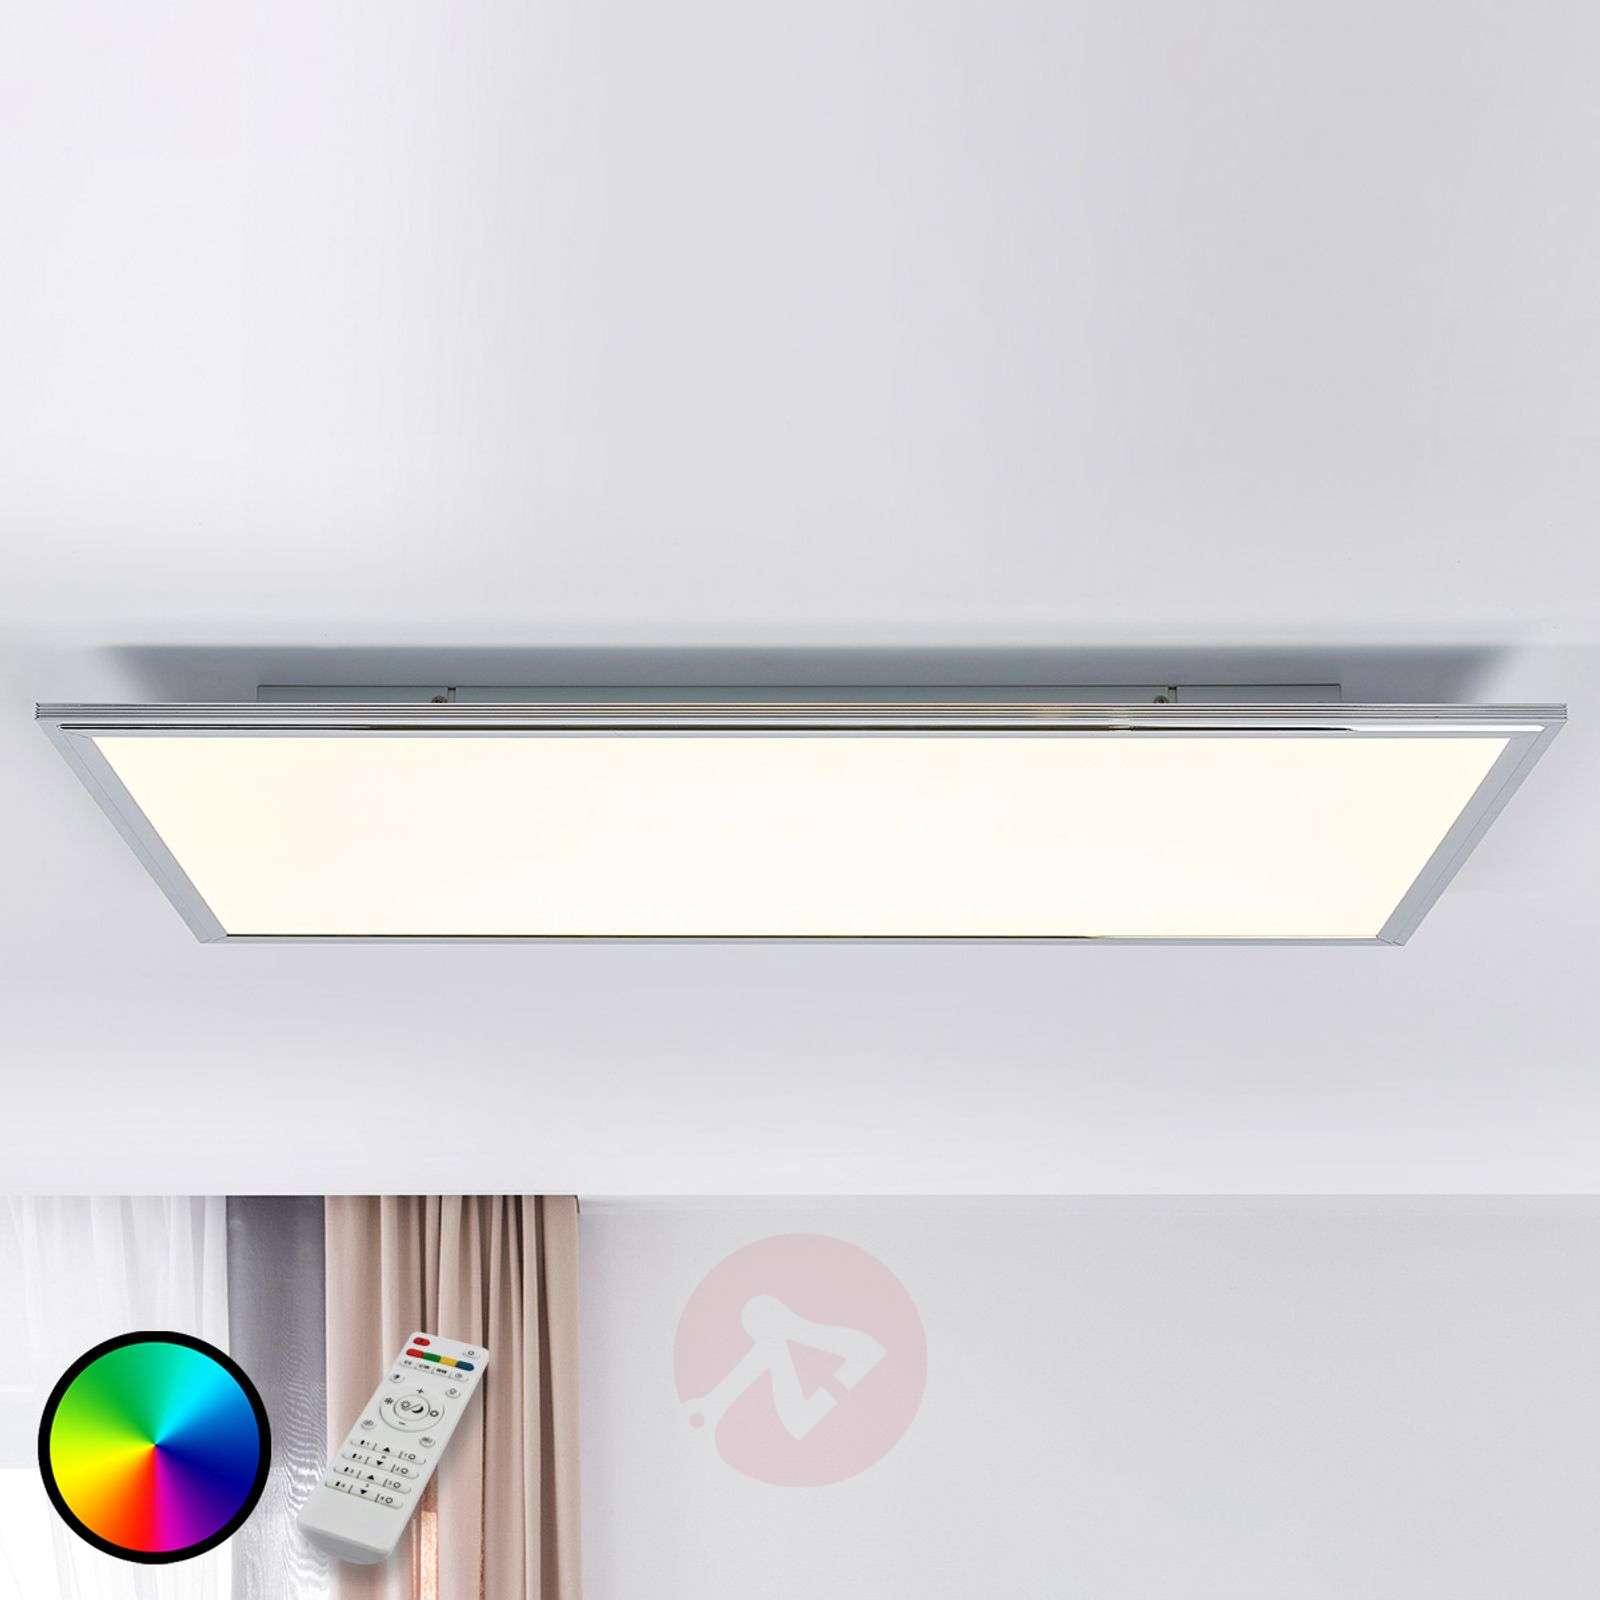 Corinna CCT LED panel, RGB, remote 80 x 40 cm-1558125-02